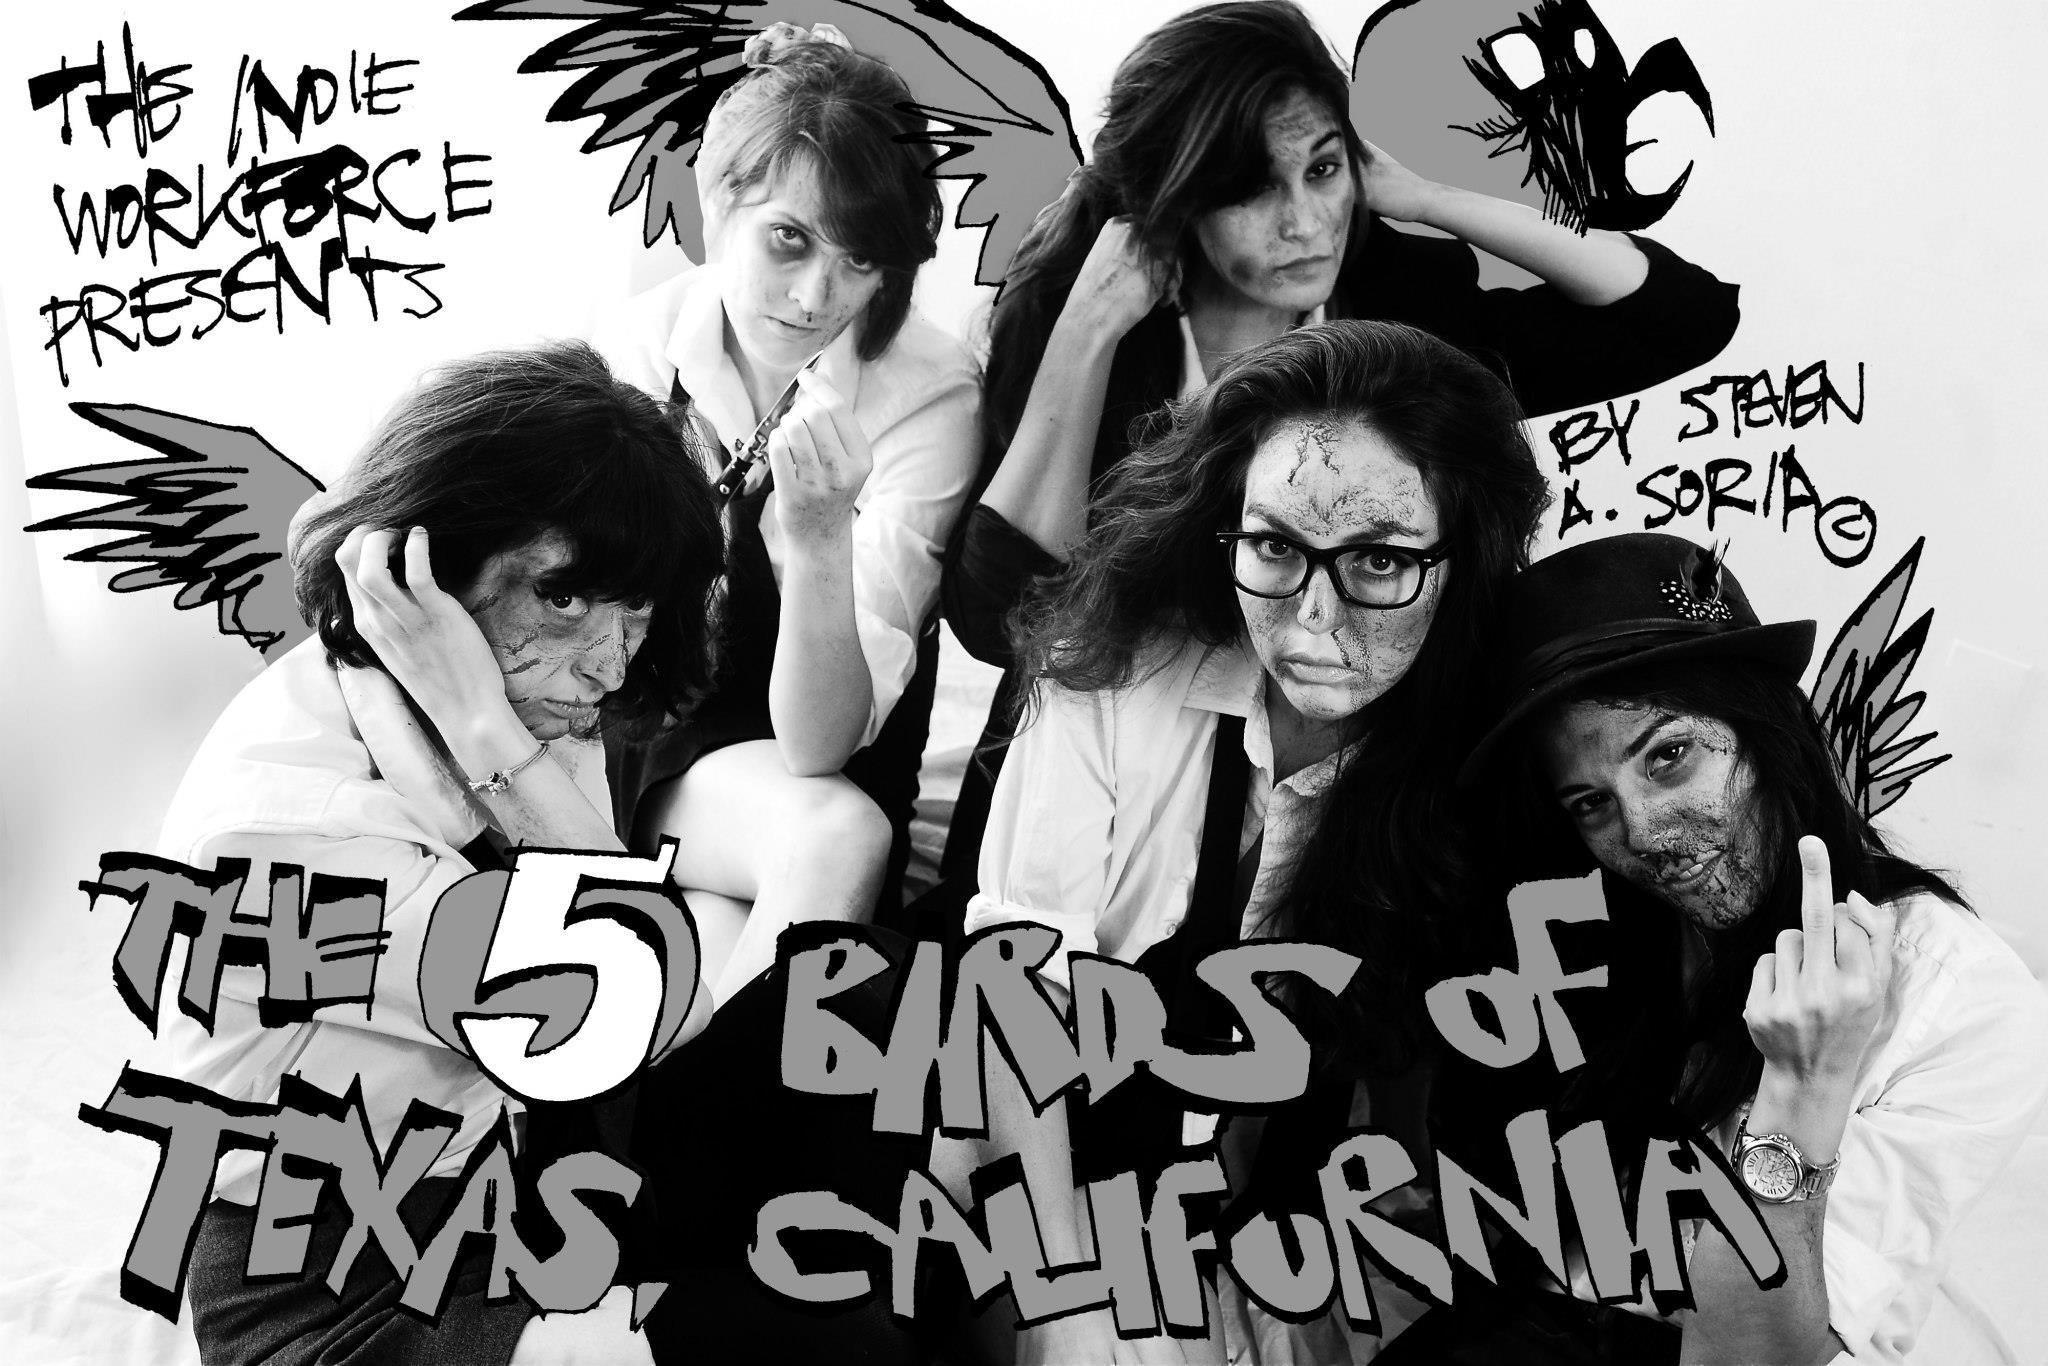 Jessica Jade Andres, Mishell Livio, Heather Higginbotham, and Melissa Loera in The Five Birds of Texas, California (2014)